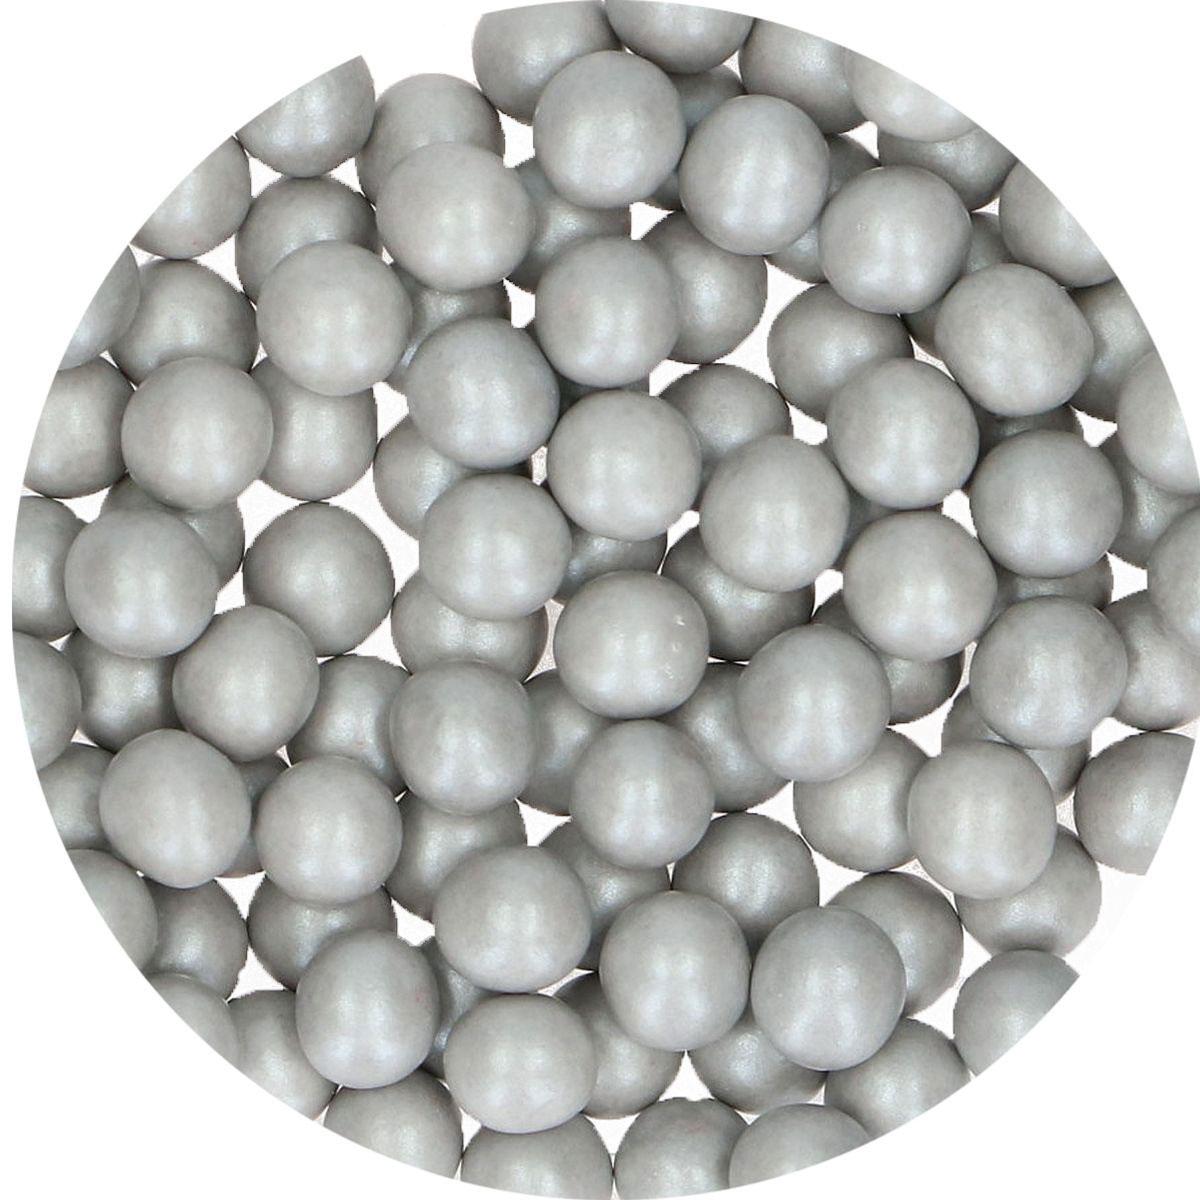 FunCakes Candy Choco Pearls Large Silbergrau 70g